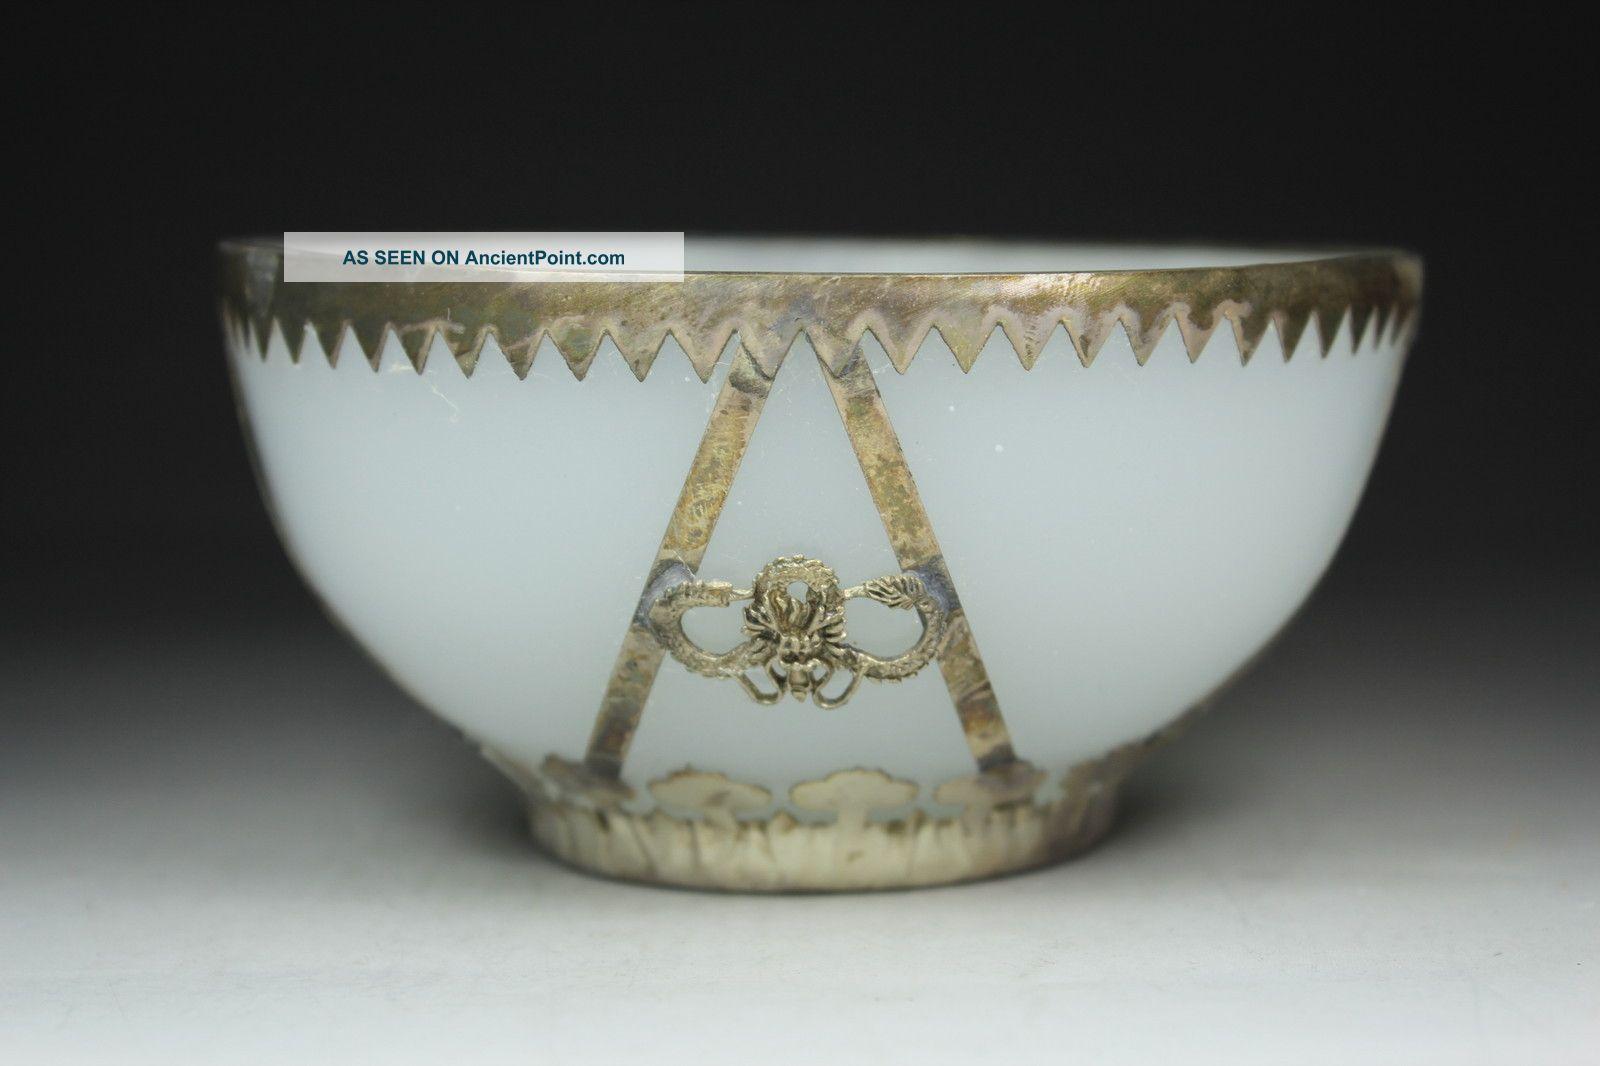 Chinese Old Beijing Coloured Glaze Wonderful Handwork Armored Dragon Bowl Uncategorized photo